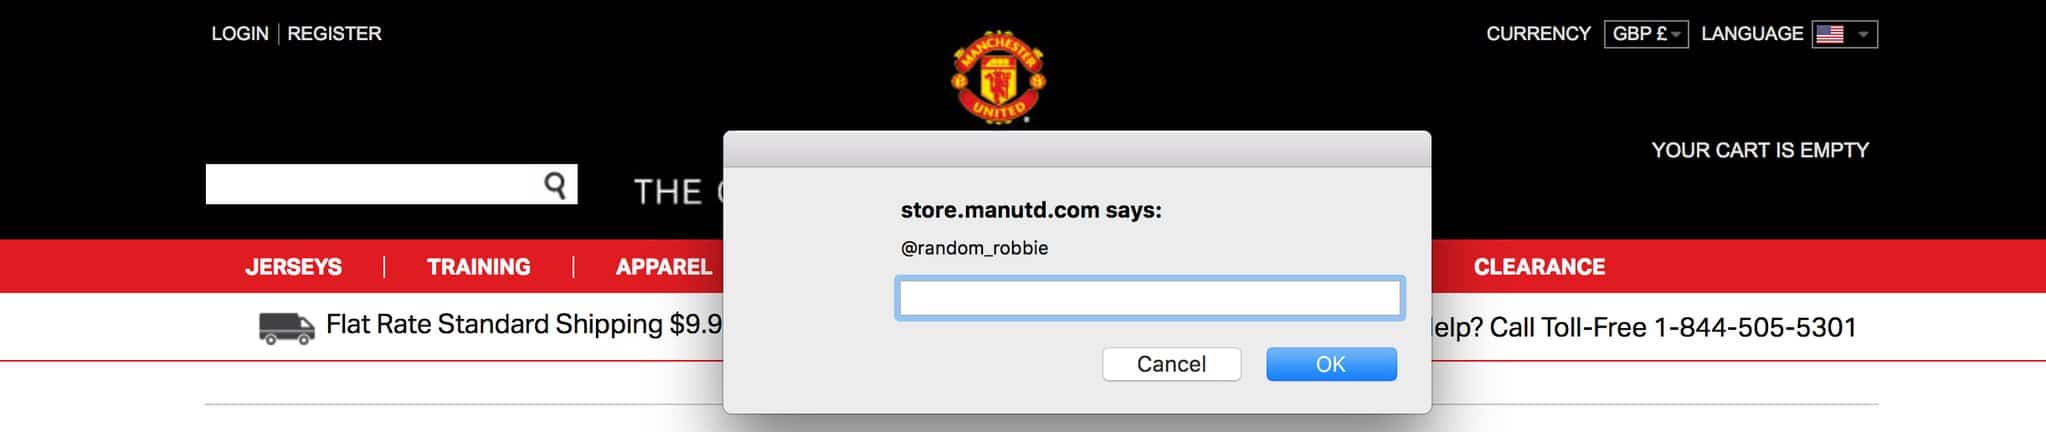 Manchester United XSS